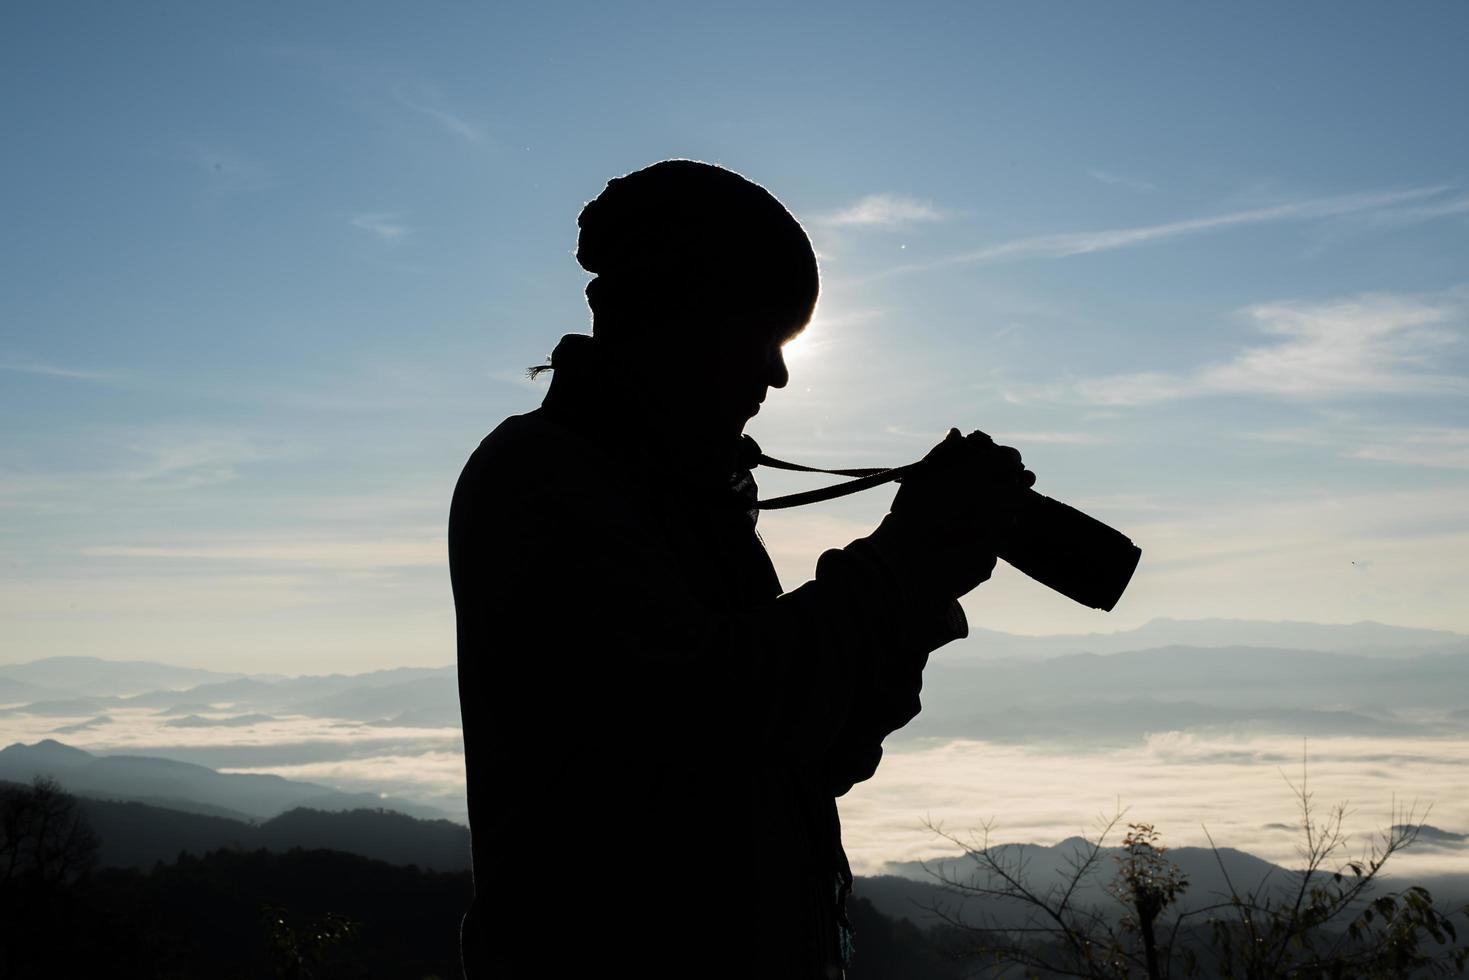 silueta de joven fotógrafo sosteniendo una cámara con paisaje de montaña foto